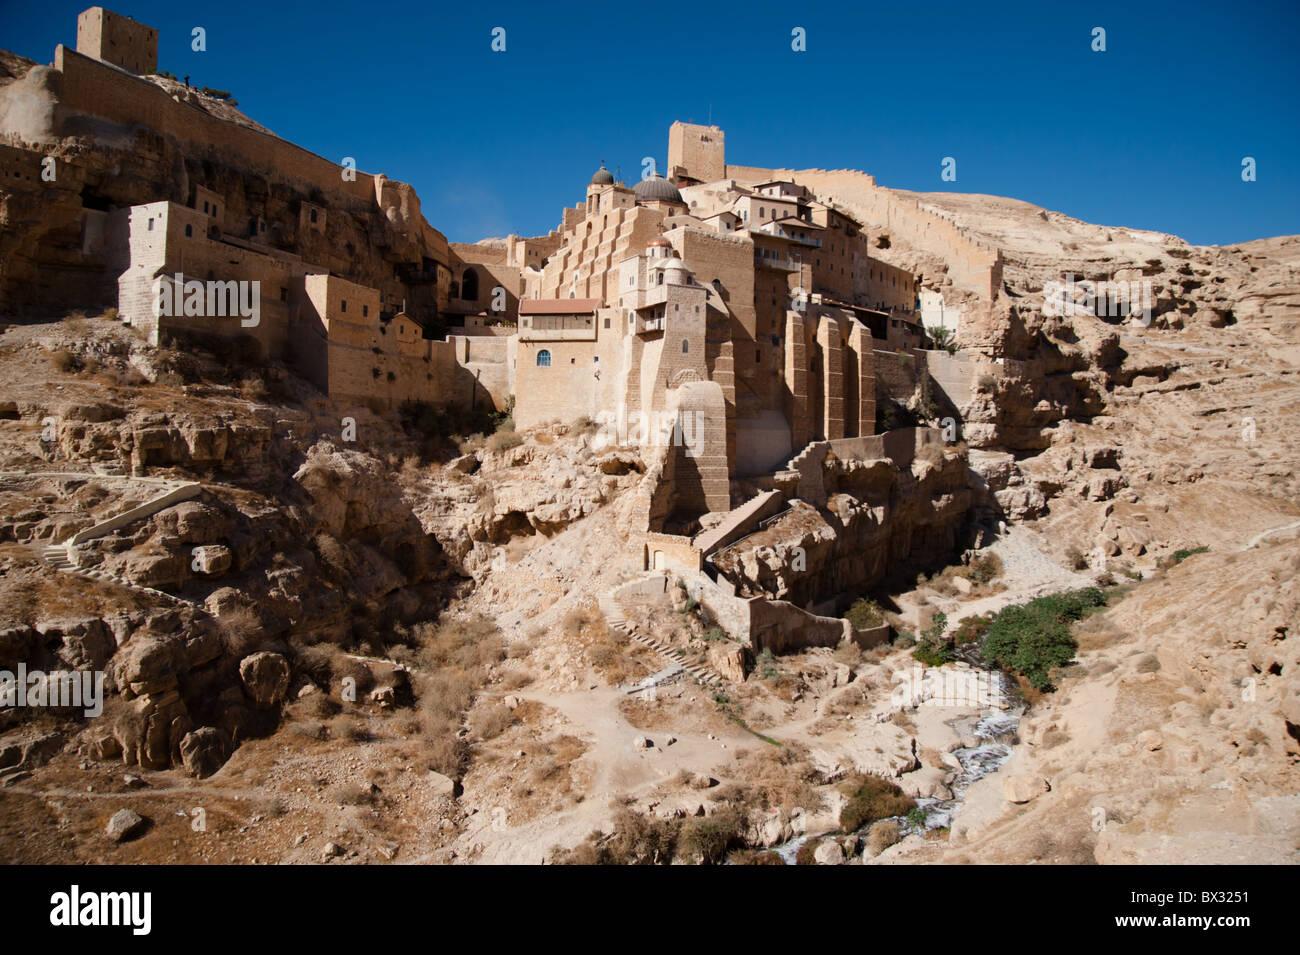 The Mar Saba monastery in the Jordan Valley desert in the West Bank. - Stock Image